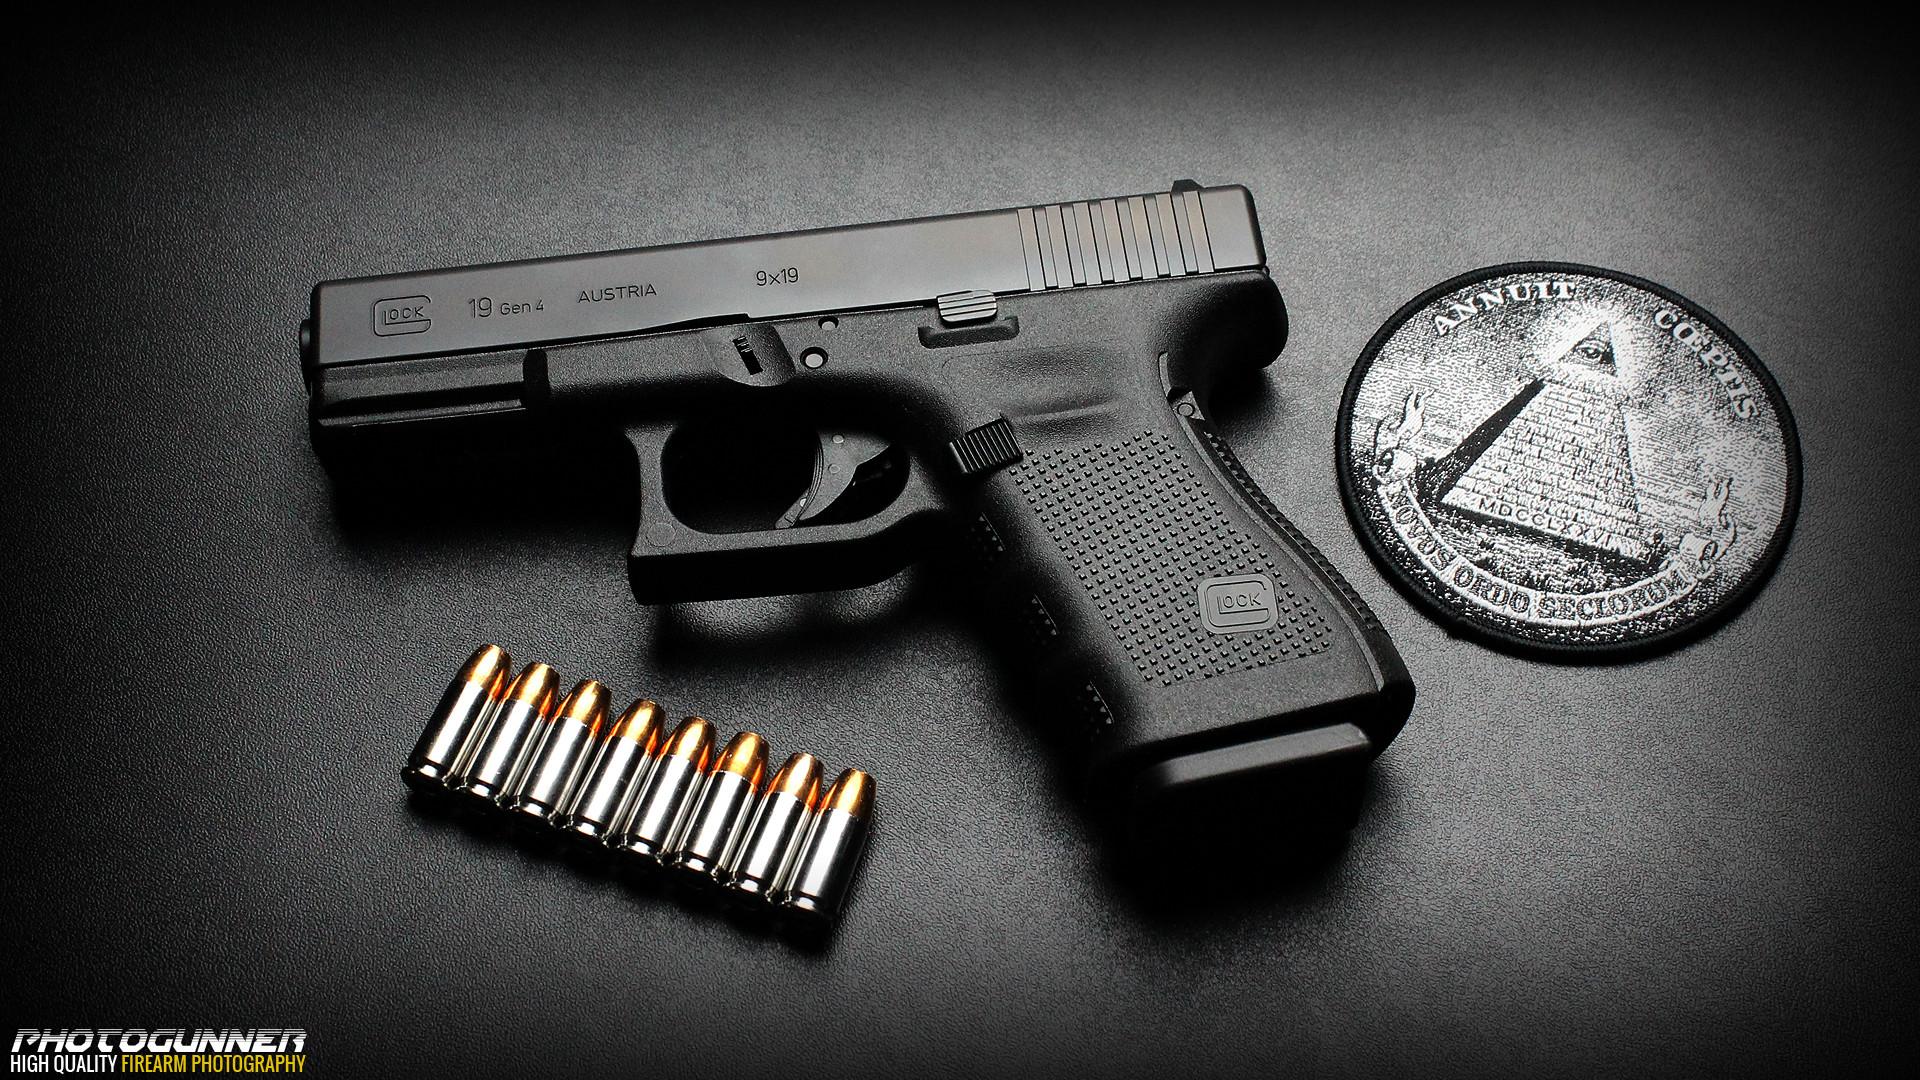 Res: 1920x1080, Glock Wallpapers Collection: .ZEE42 Glock Wallpapers